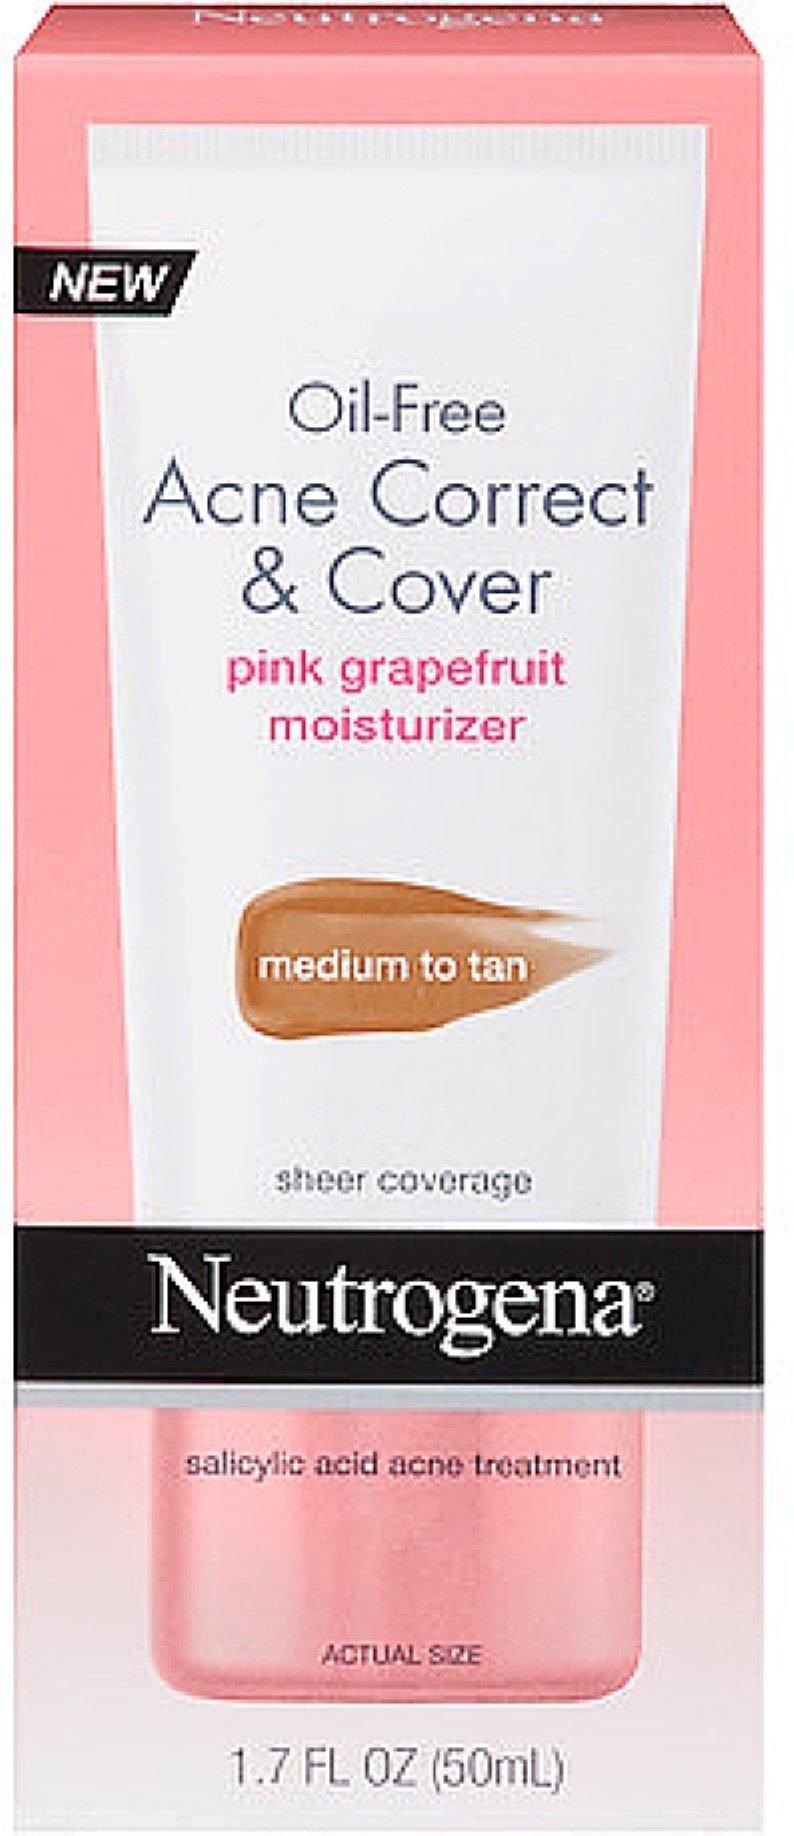 Neutrogena Oil-Free Acne Correct & Cover Pink Grapefruit Moisturizer, Medium to Tan 1.7 oz (10 Pack)